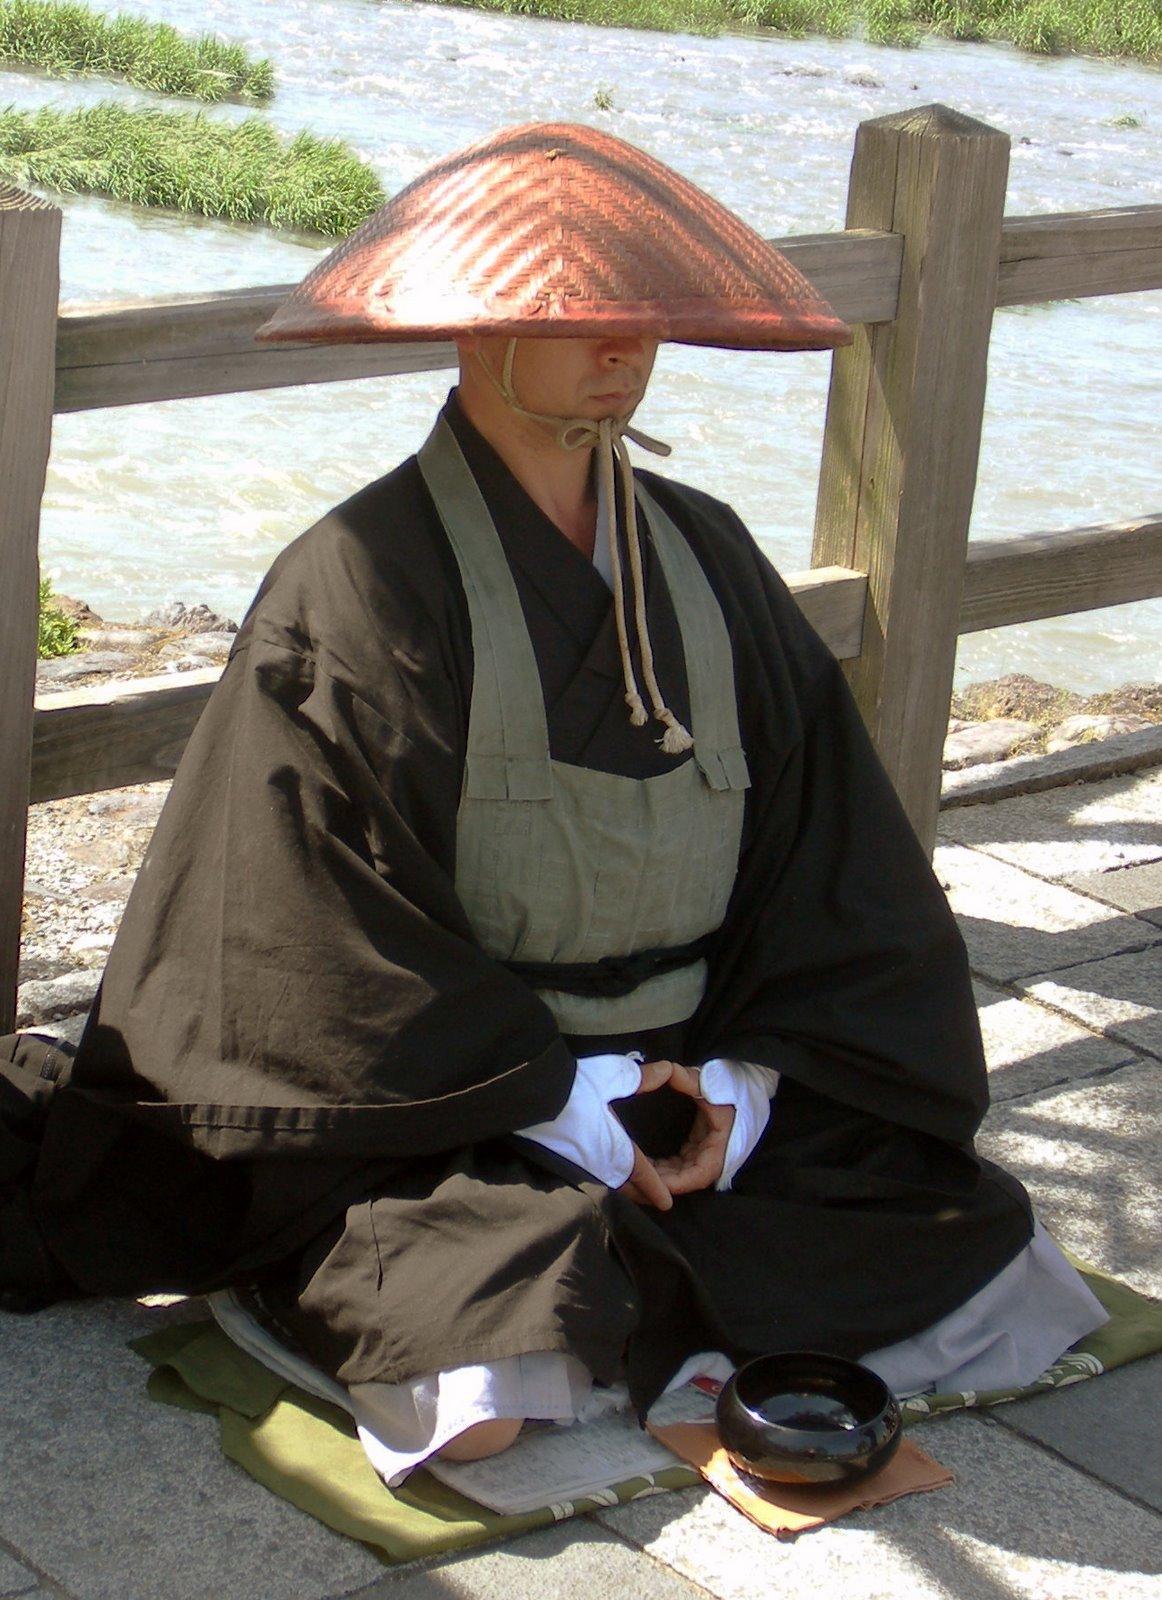 Zen Buddhist undergoing meditation.